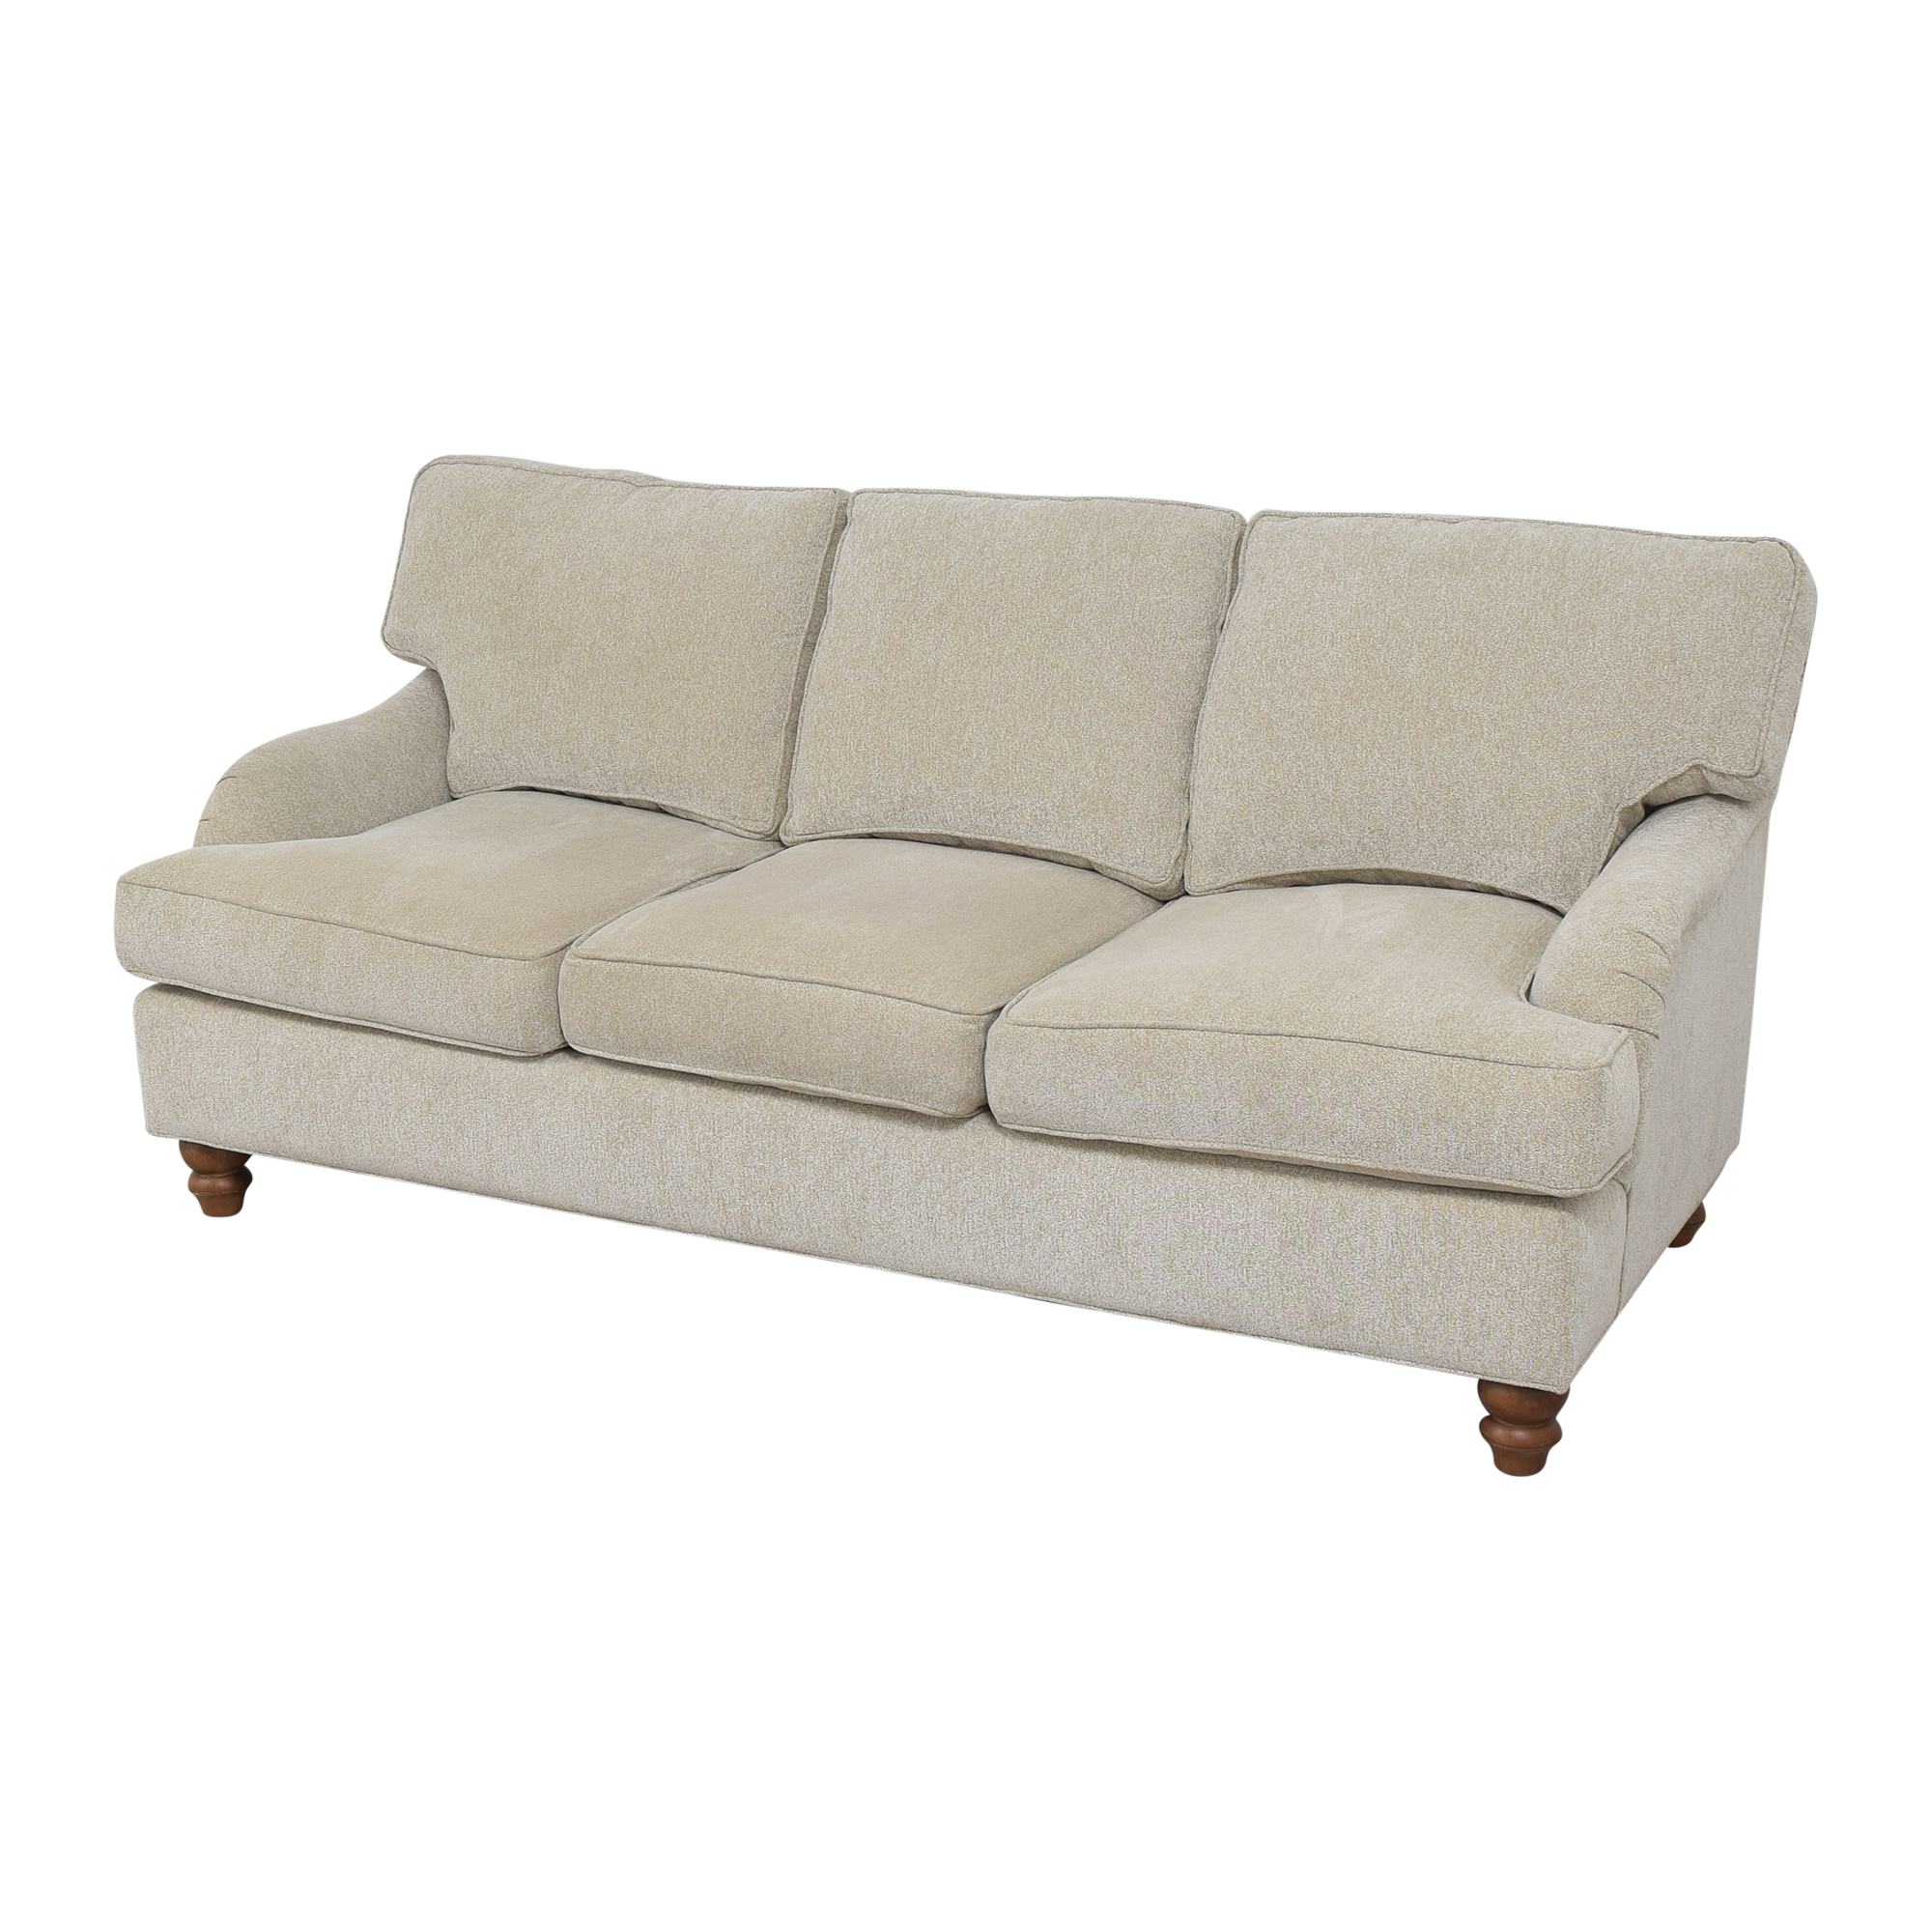 Drexel Heritage Drexel Heritage Three Cushion Sofa pa